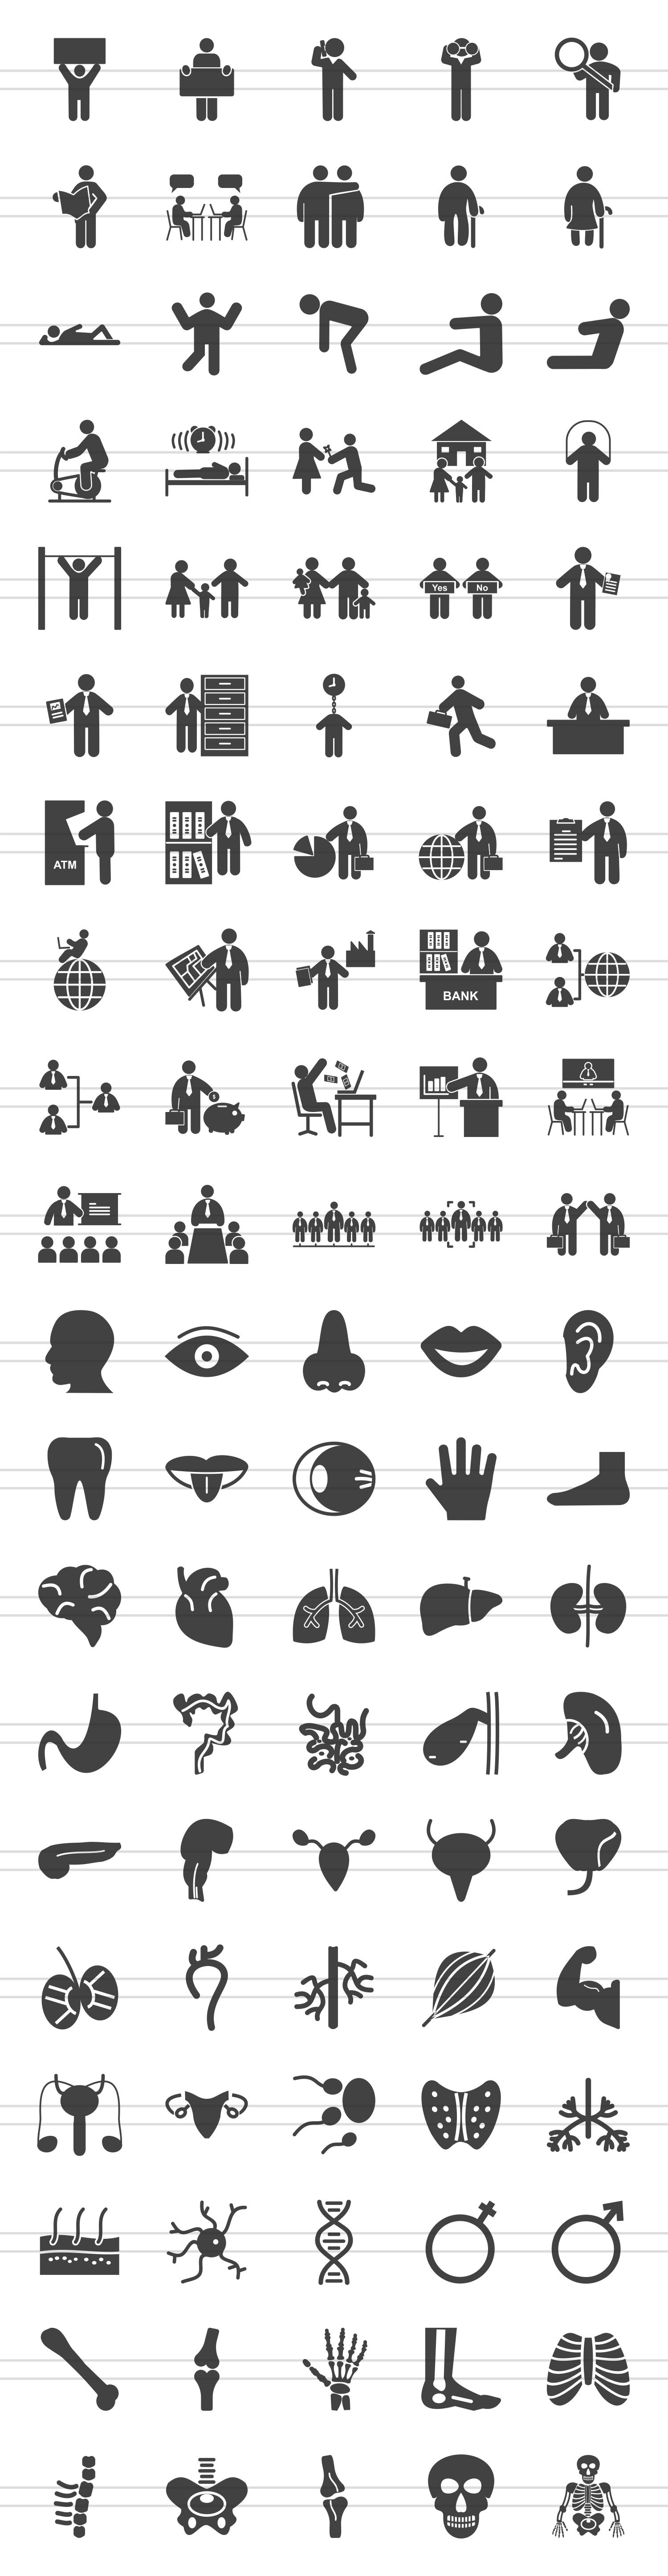 100 Humans & Anatomy Glyph Icons example image 2